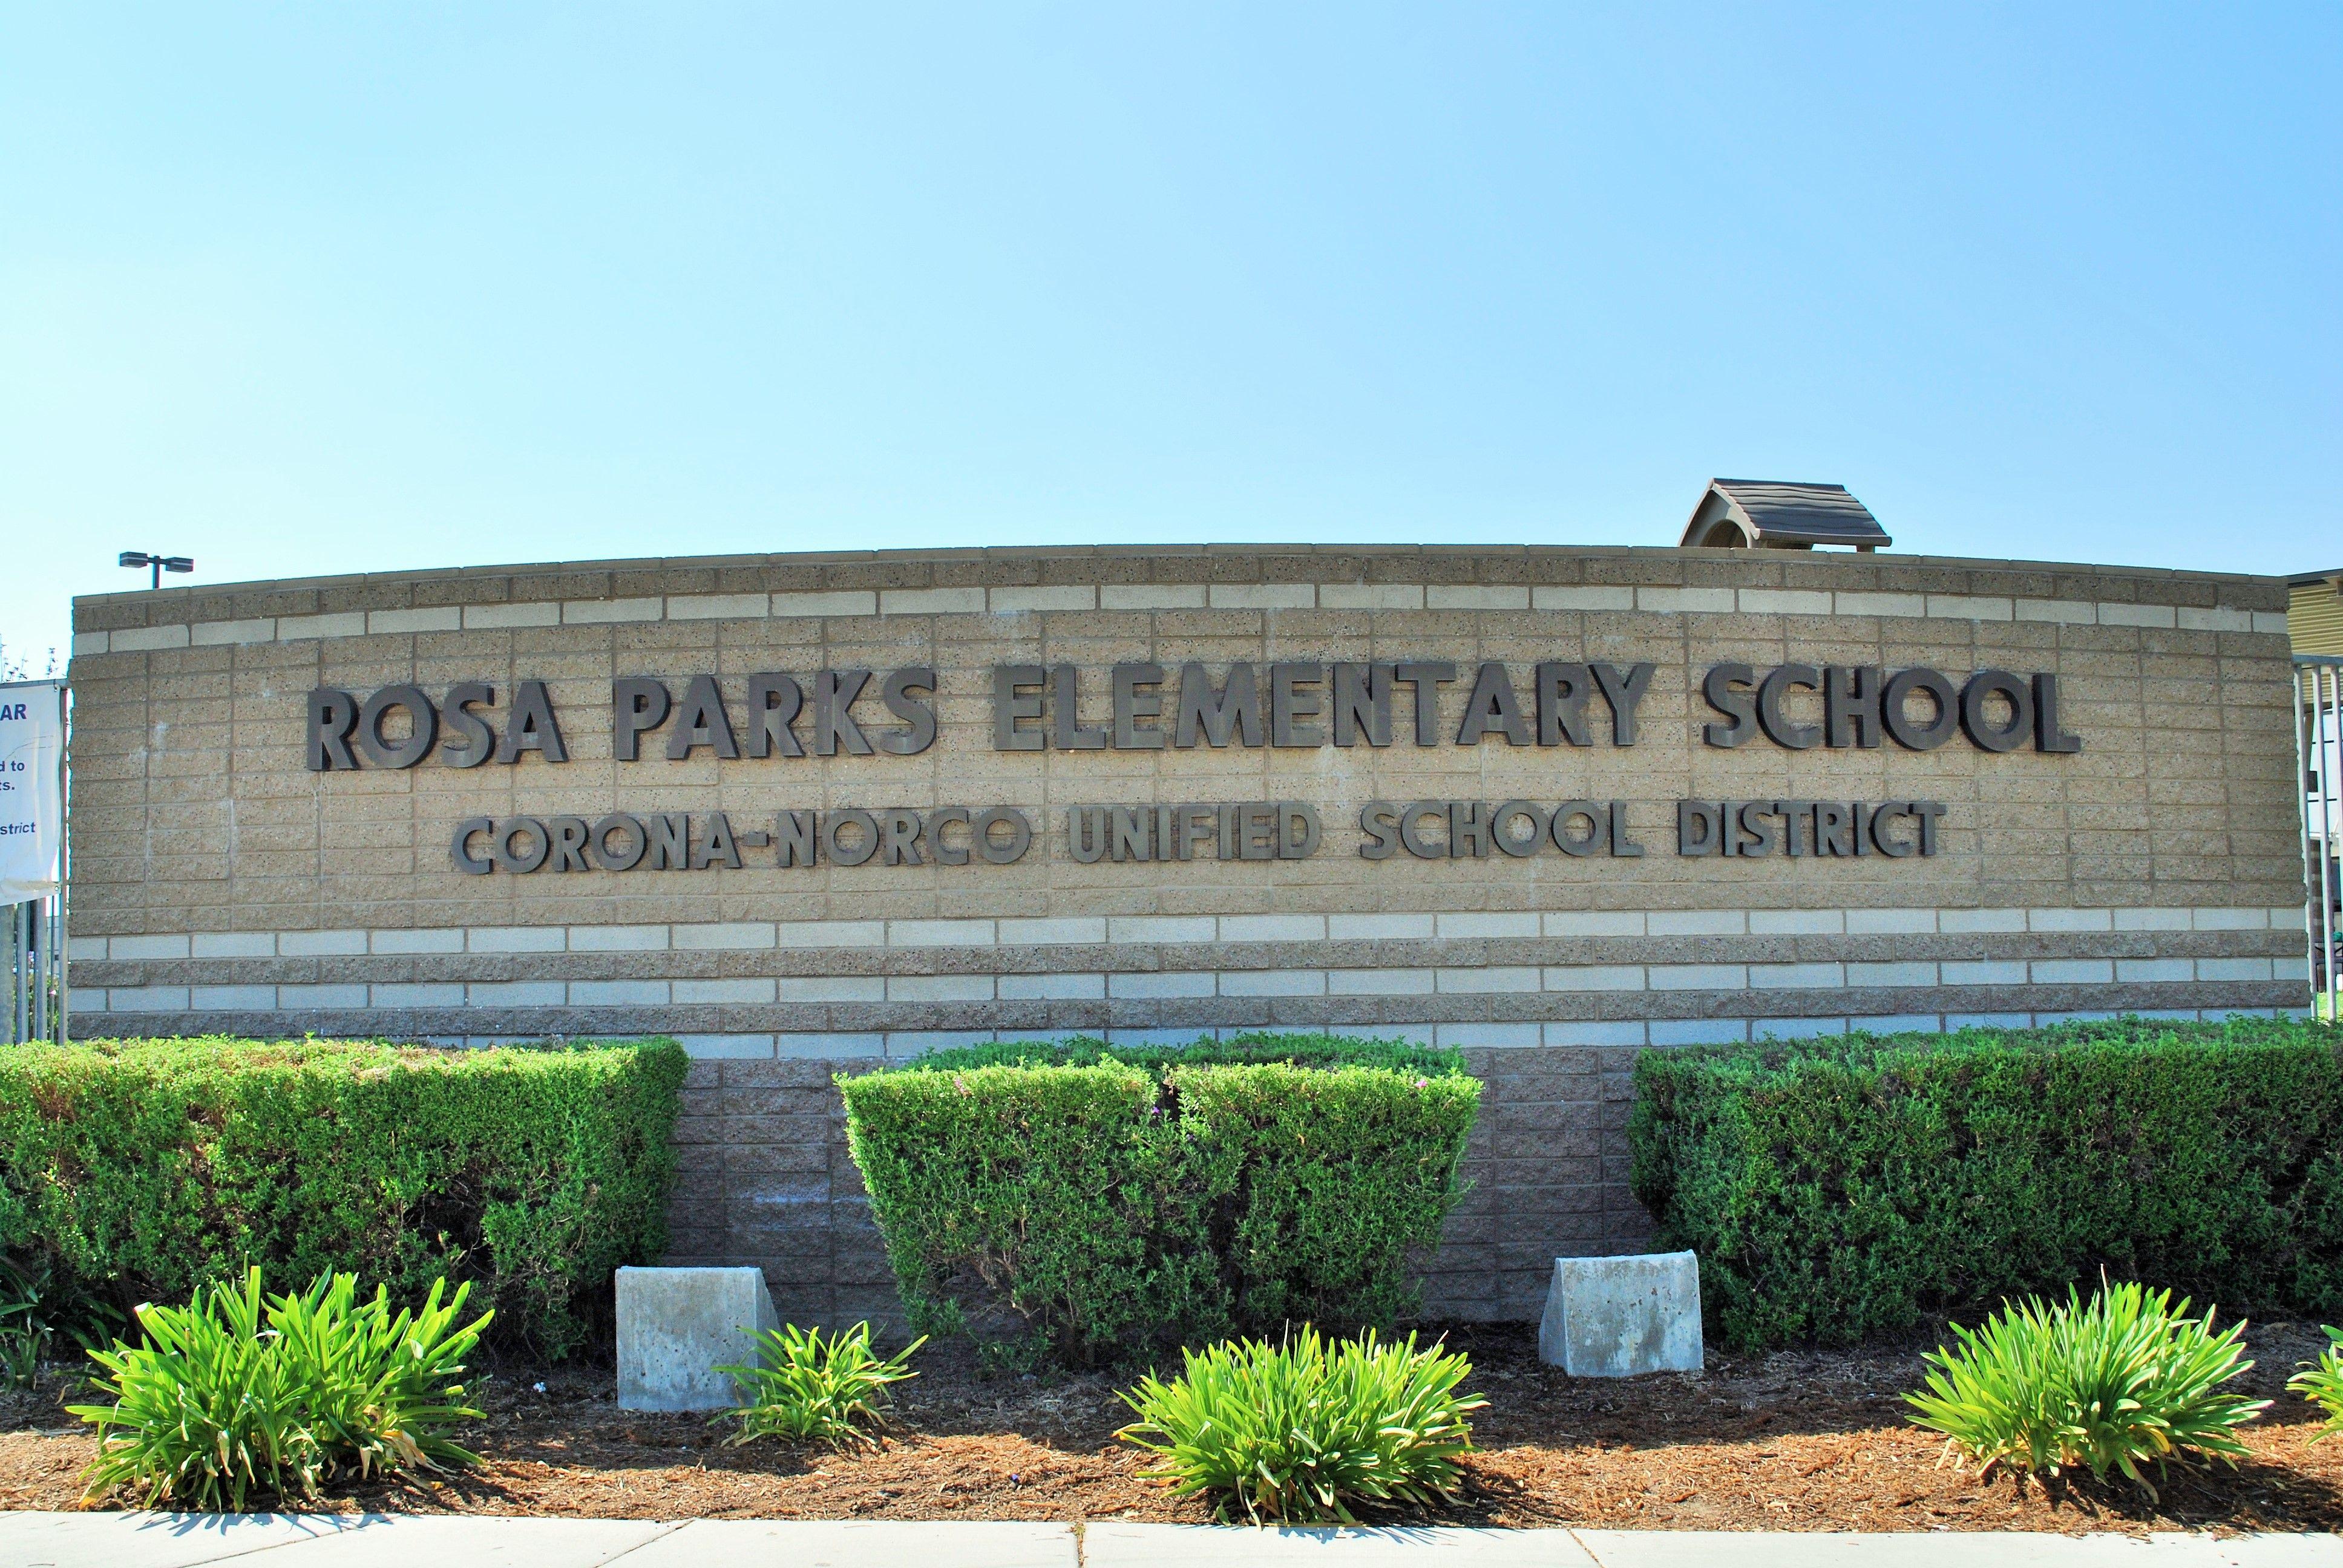 Rosa Parks Elementary School Entrance Sign In Eastvale California